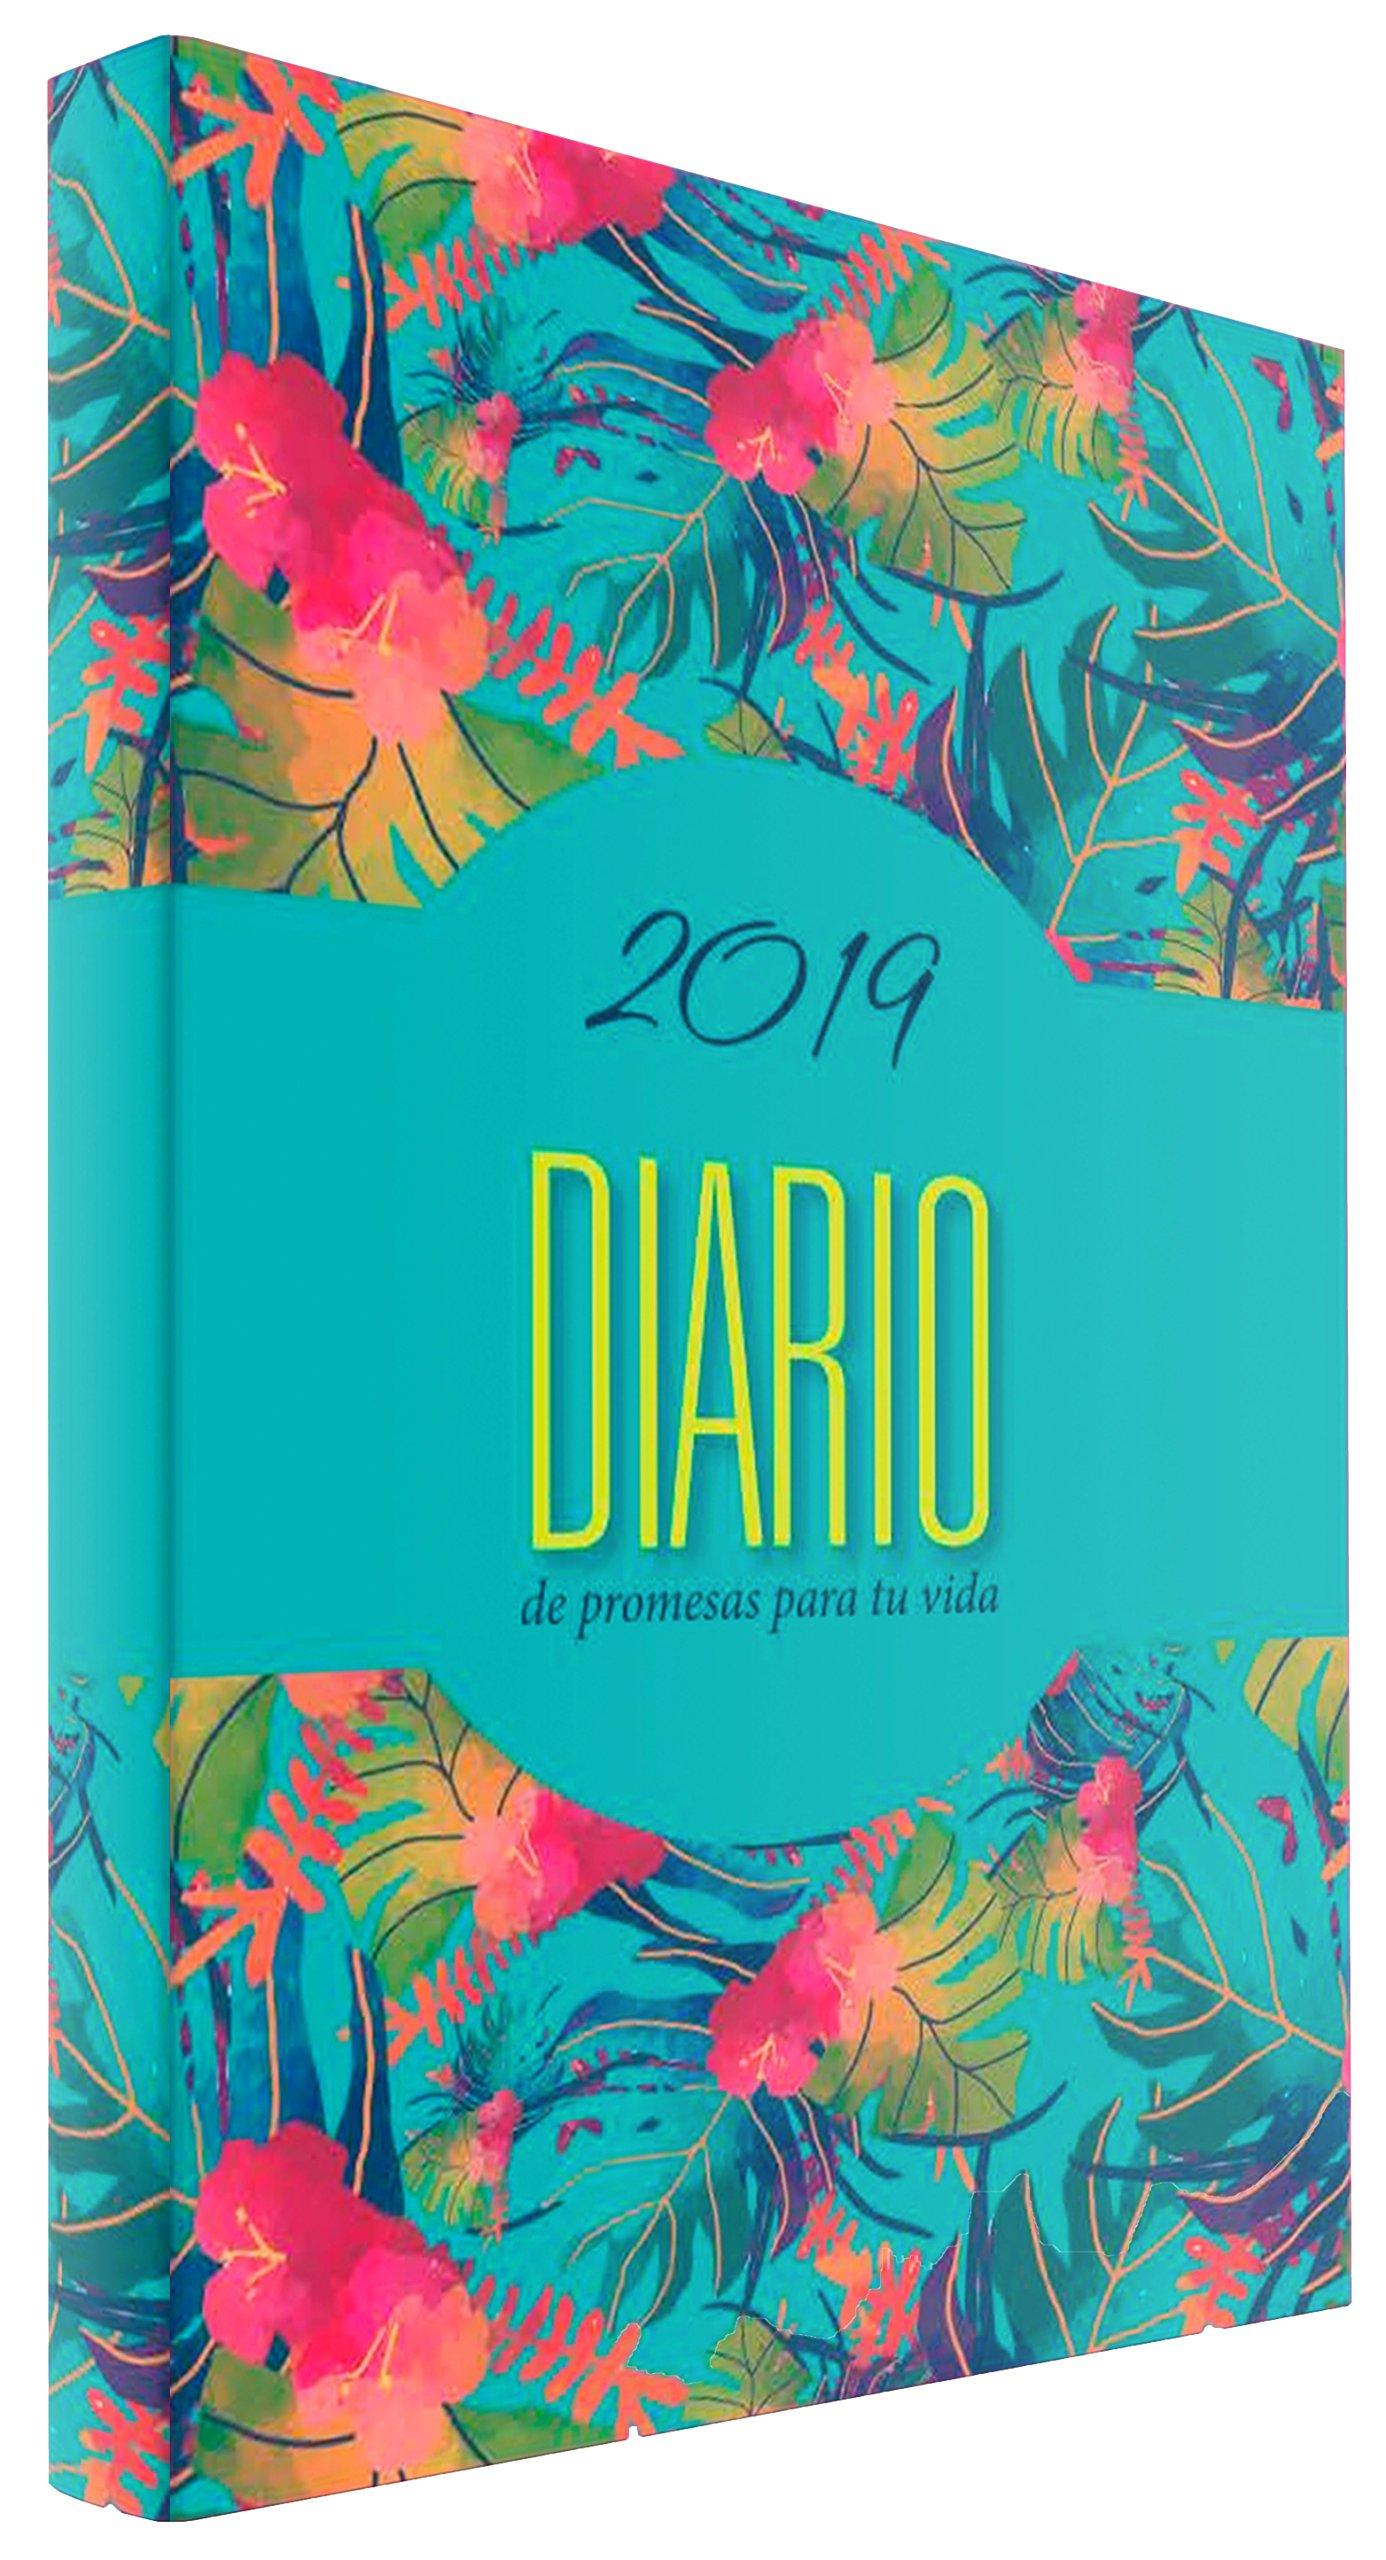 Agenda 2019 Diario de promesas - Fiesta (Spanish Edition ...